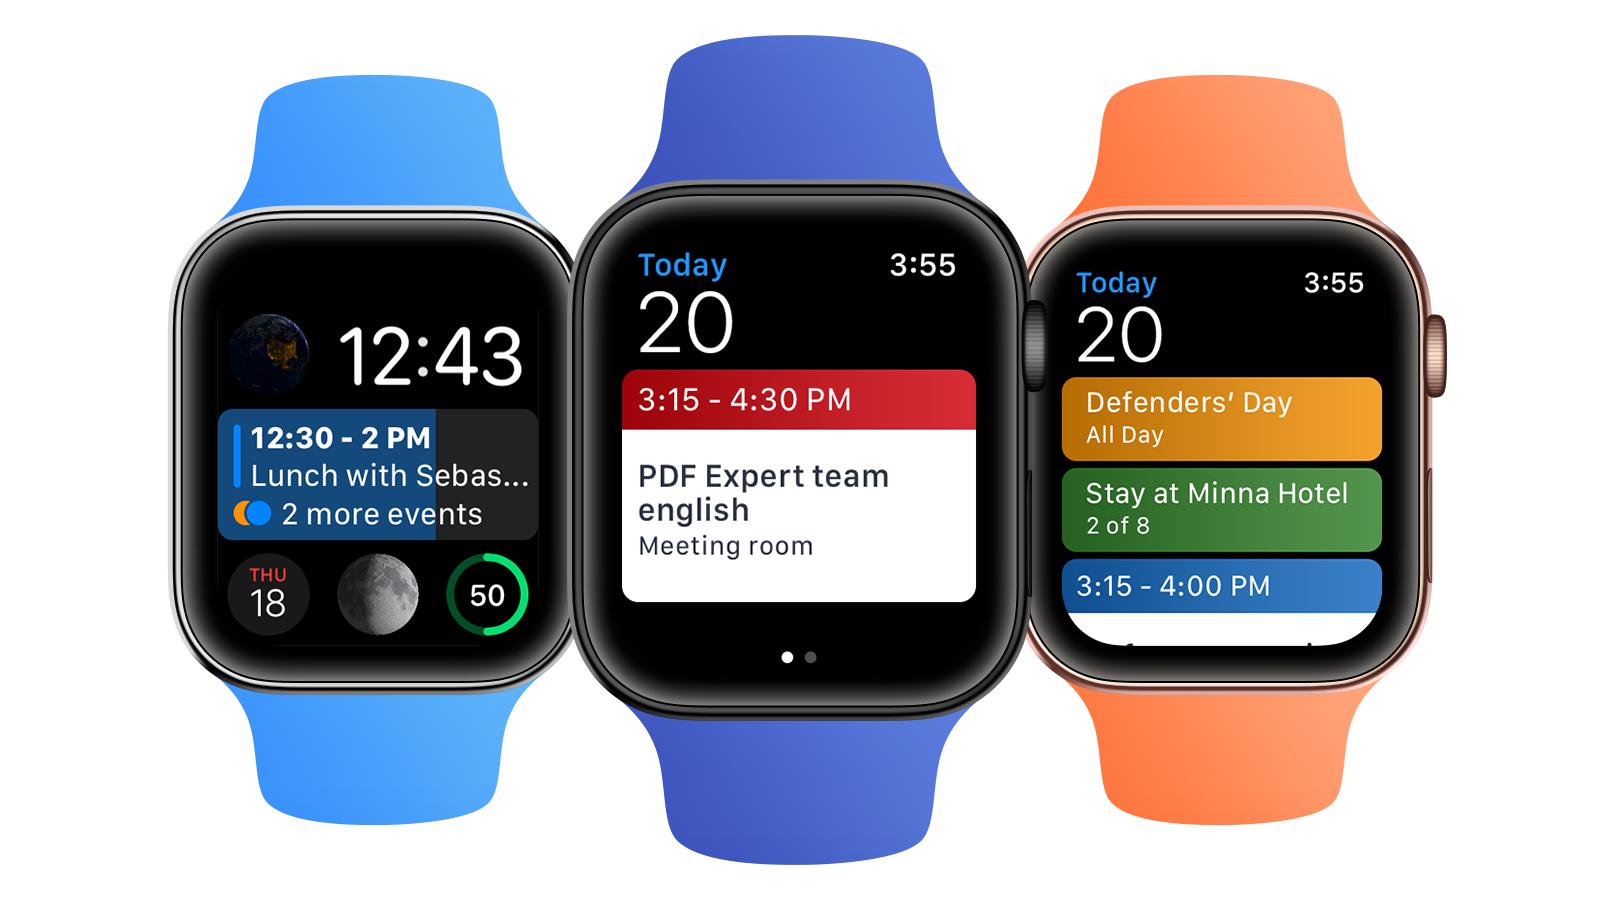 Calendars 5 Apple Watch Siri